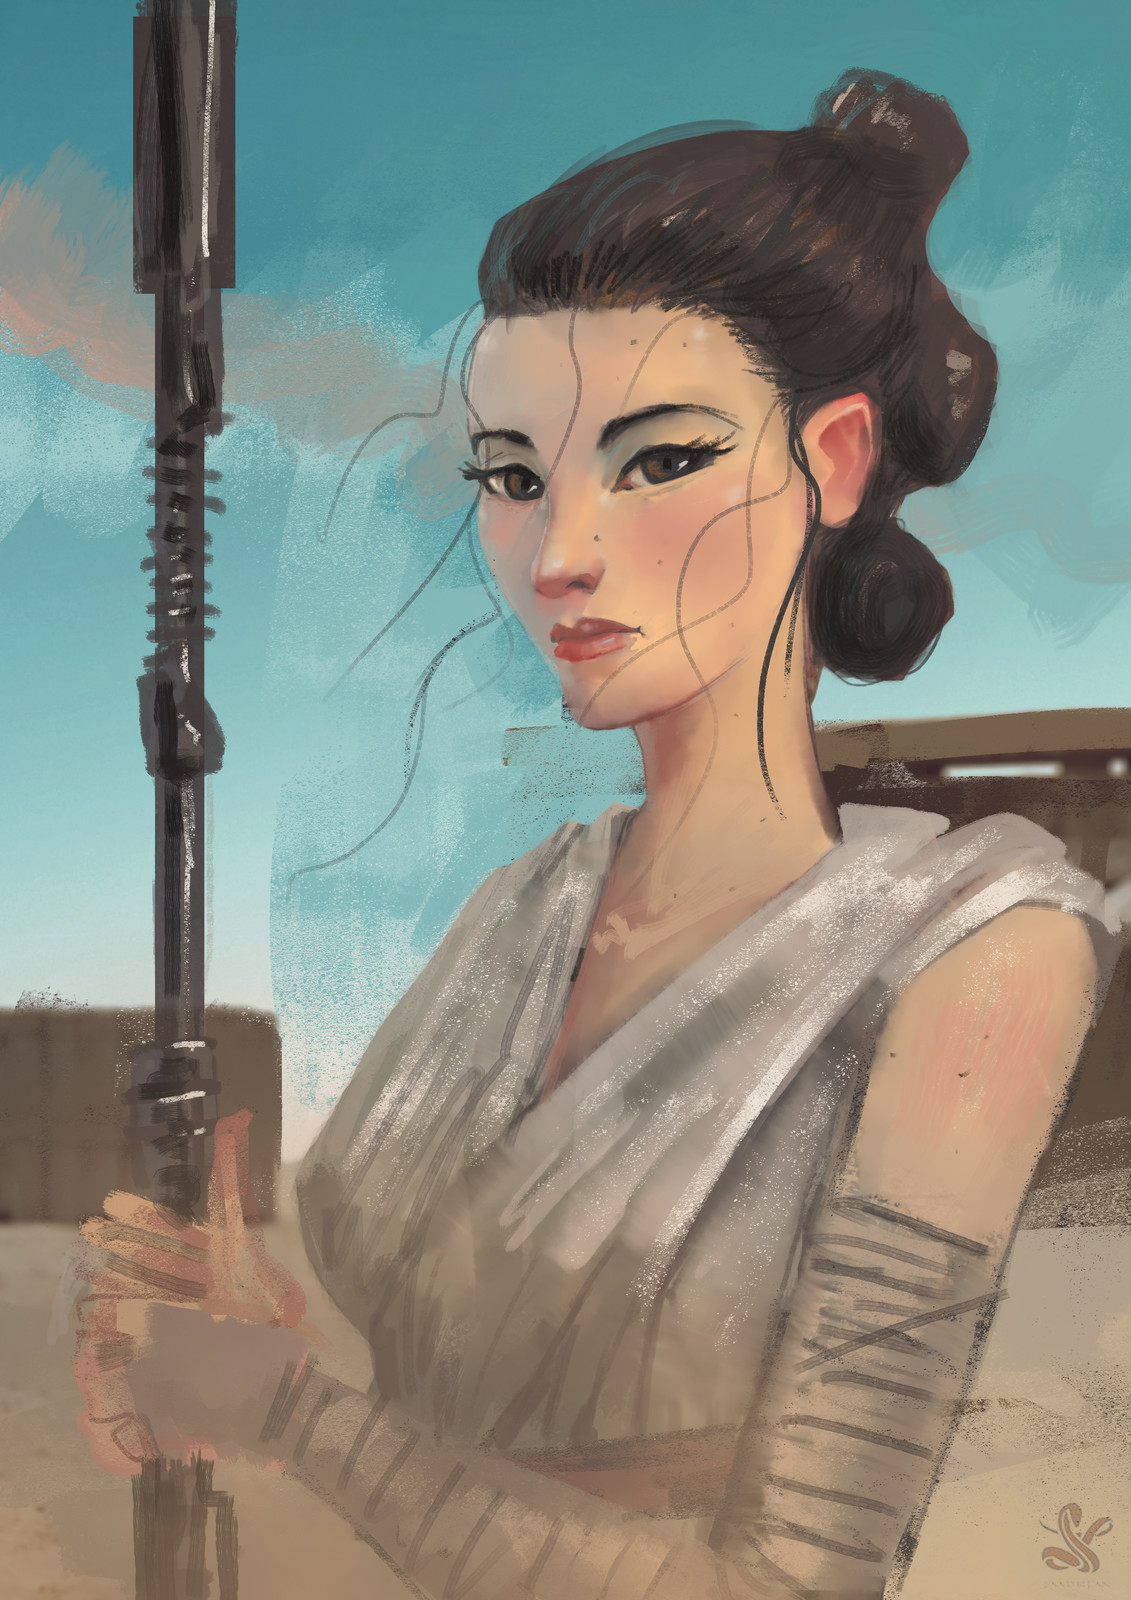 rey sketch